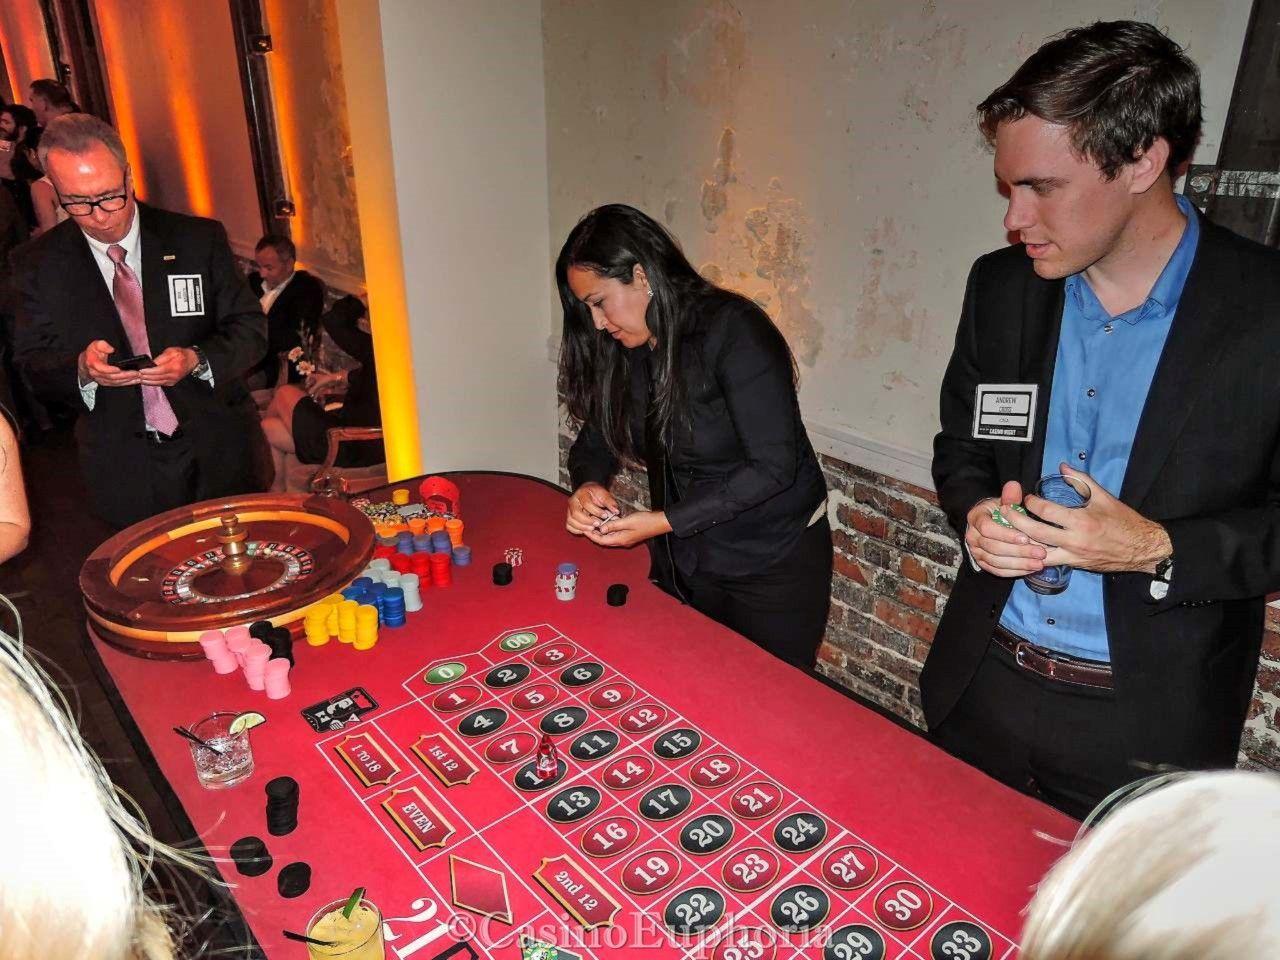 Leelanau sands casino promotions